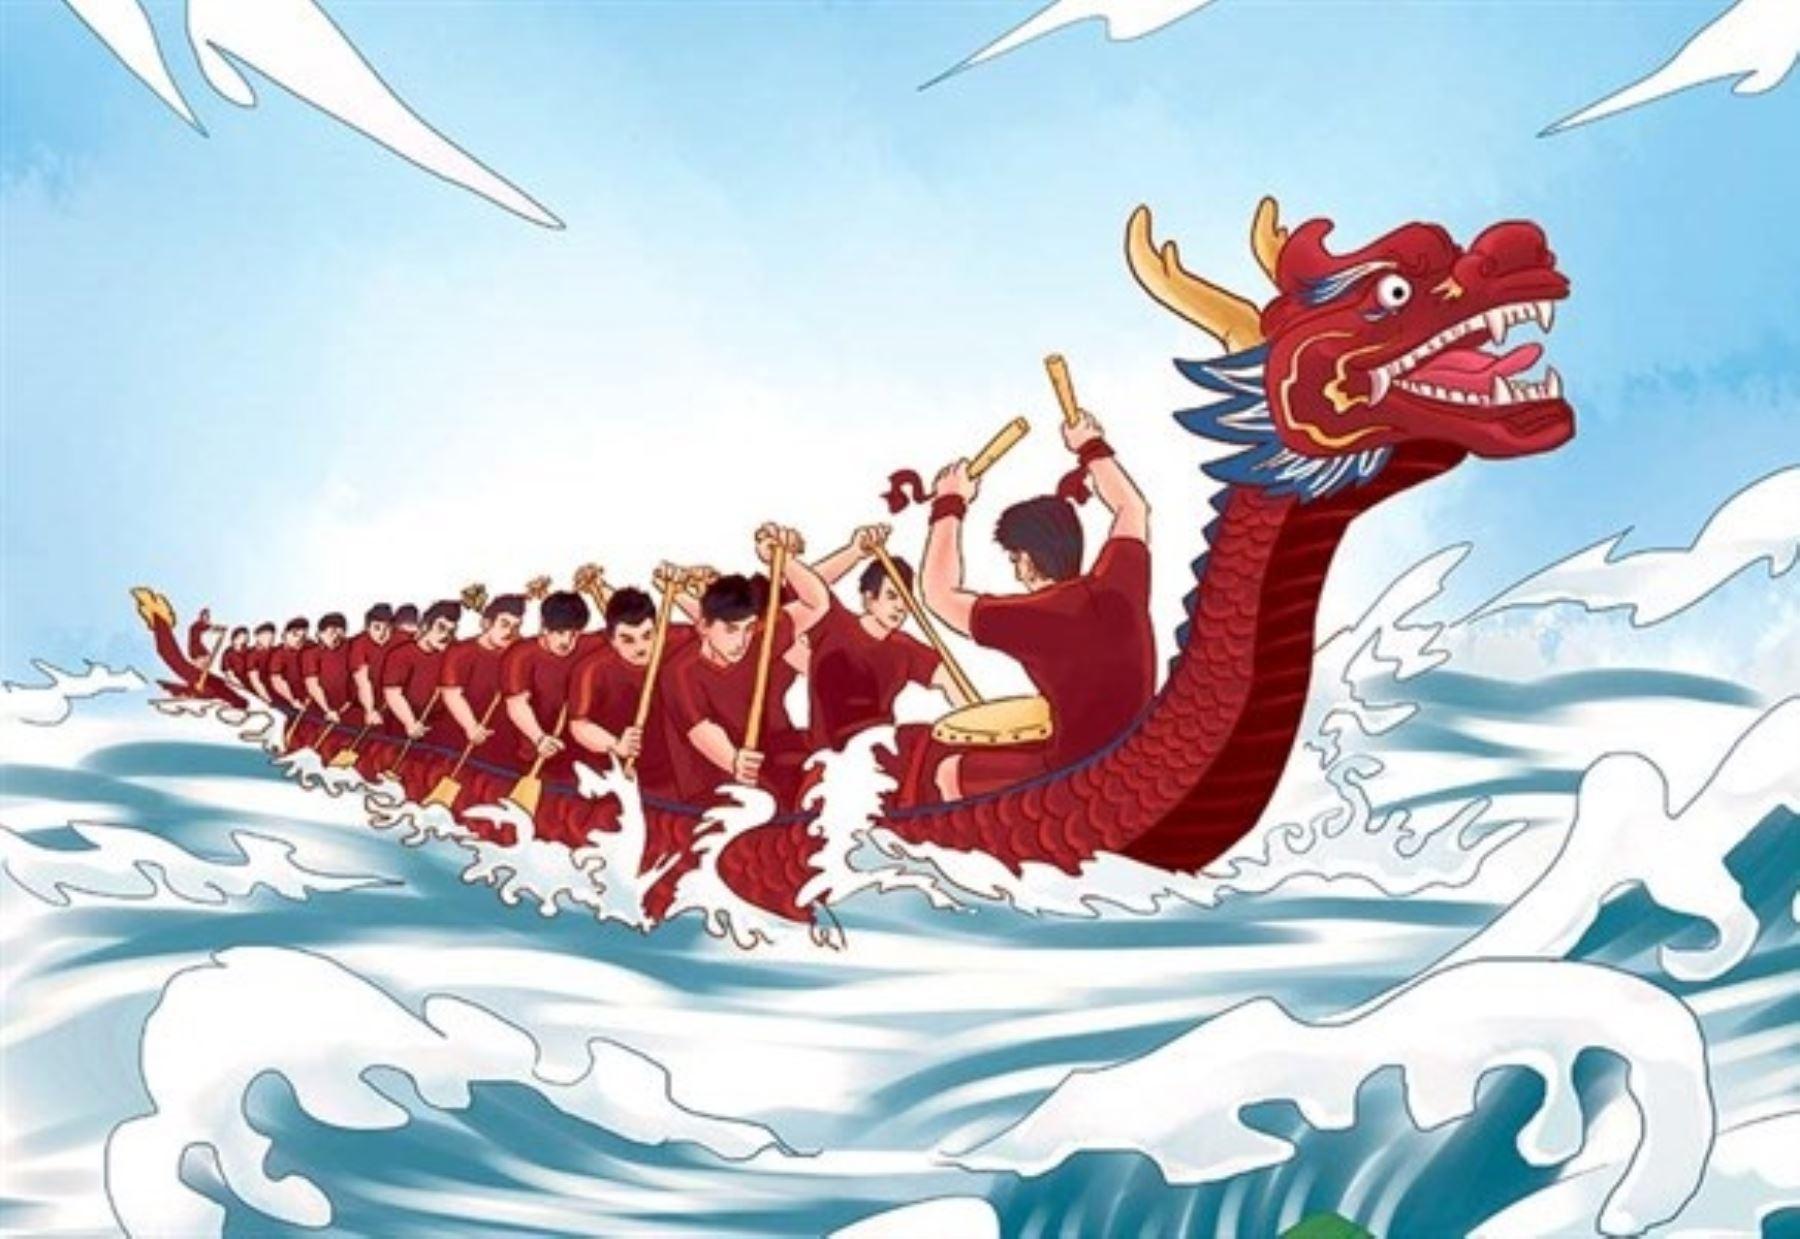 Ilustración de libro sobre leyendas chinas.